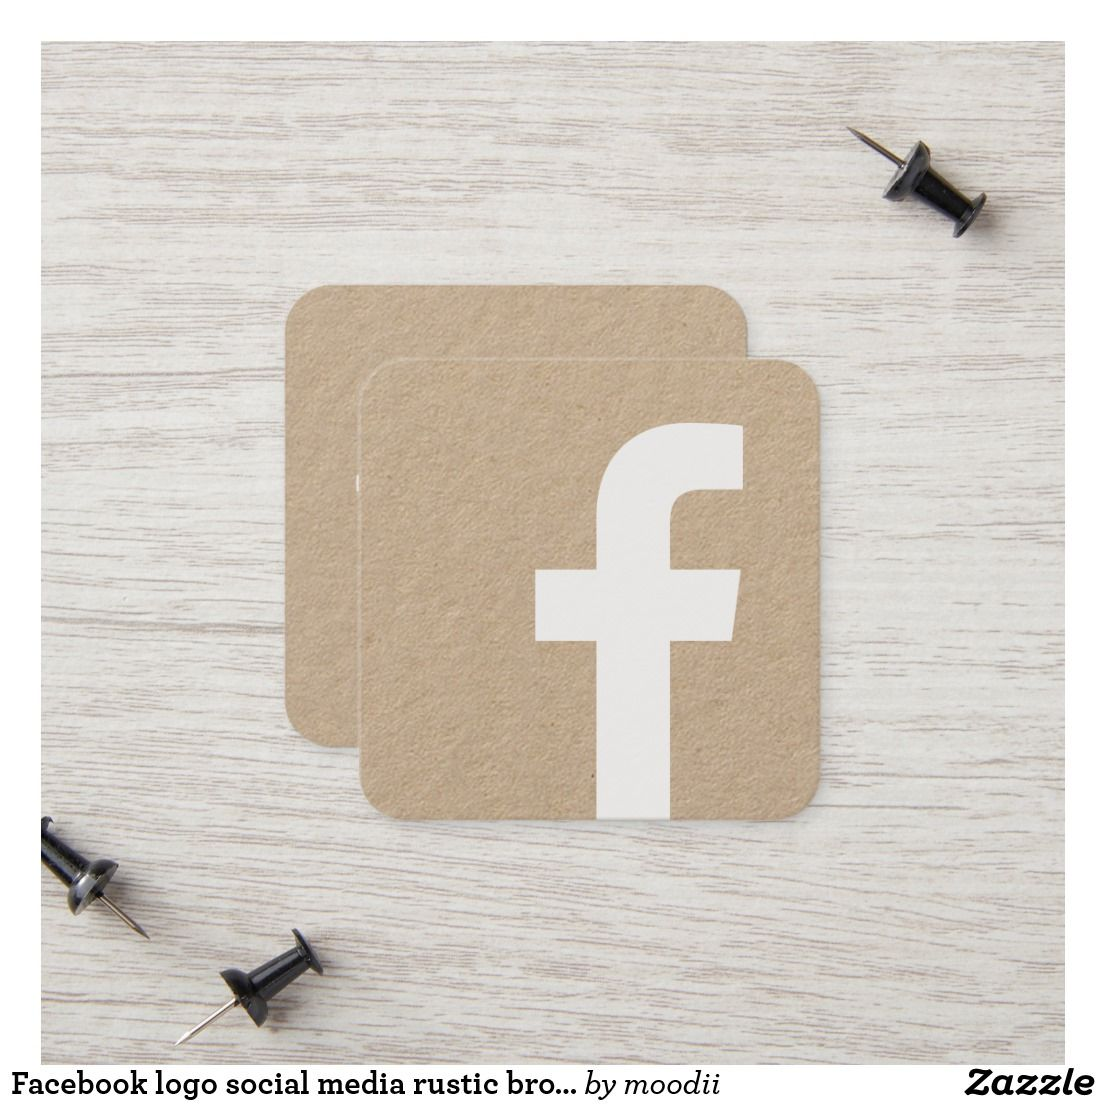 Facebook Logo Social Media Rustic Brown Kraft Calling Card Zazzle Com In 2021 Calling Cards Iphone App Design Logo Facebook